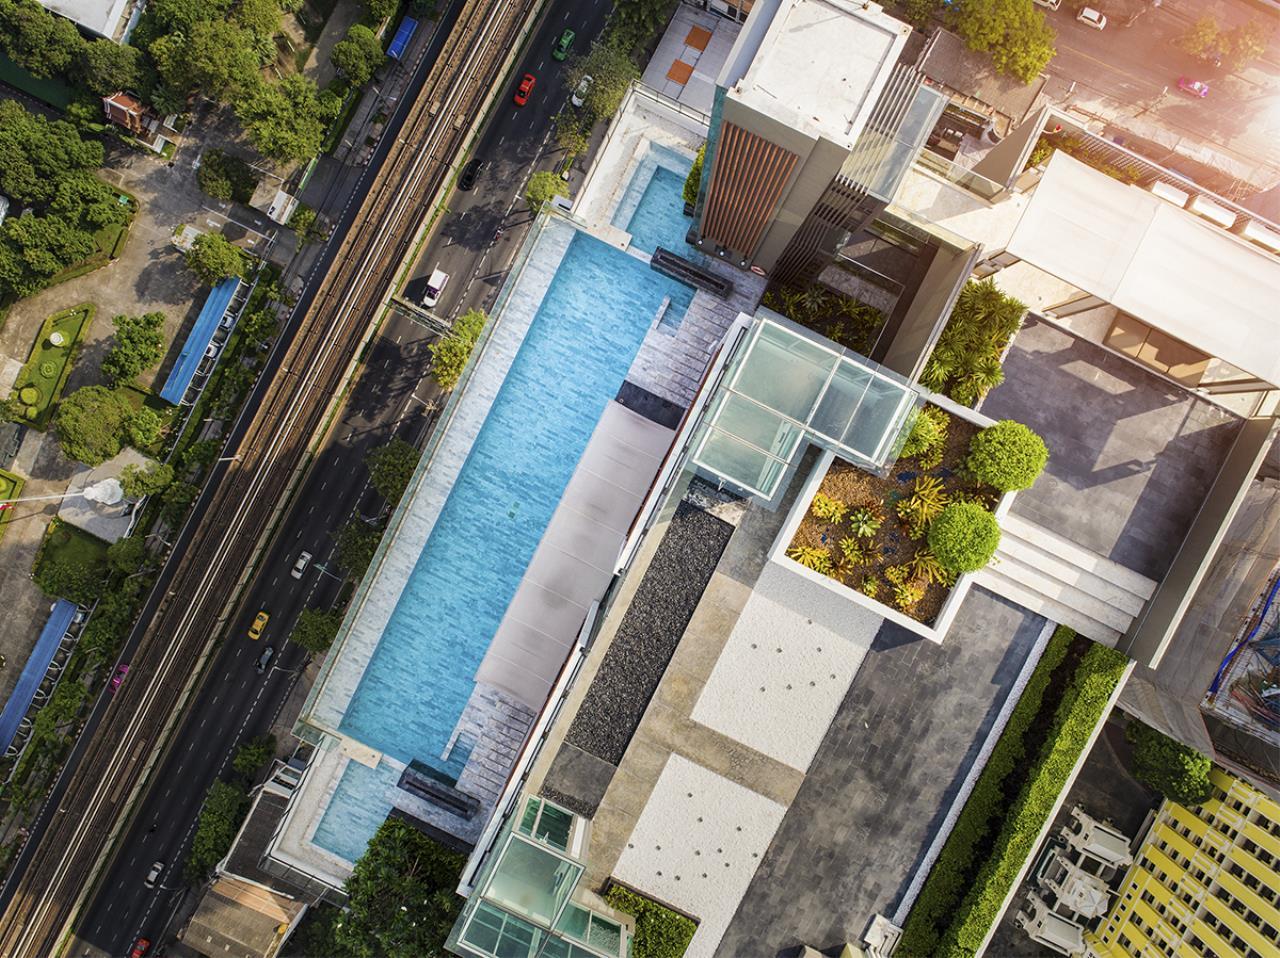 Century21 Skylux Agency's M Phayathai / Condo For Sale / 2 Bedroom / 65.96 SQM / BTS Sukhumvit Line / Bangkok 8